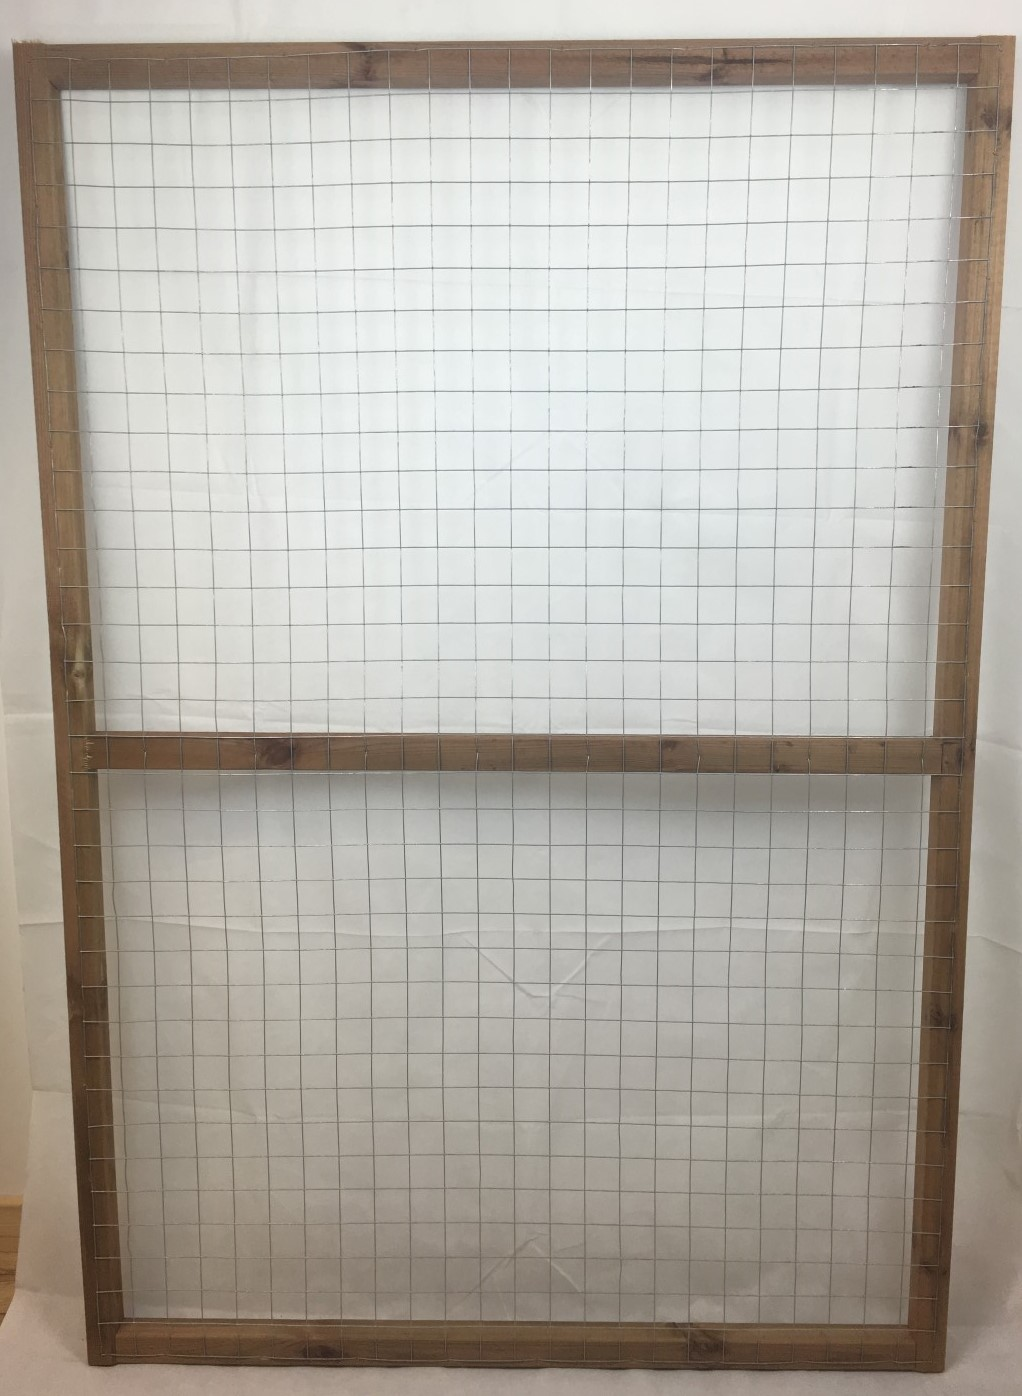 6x4 door for aviary and pet runs